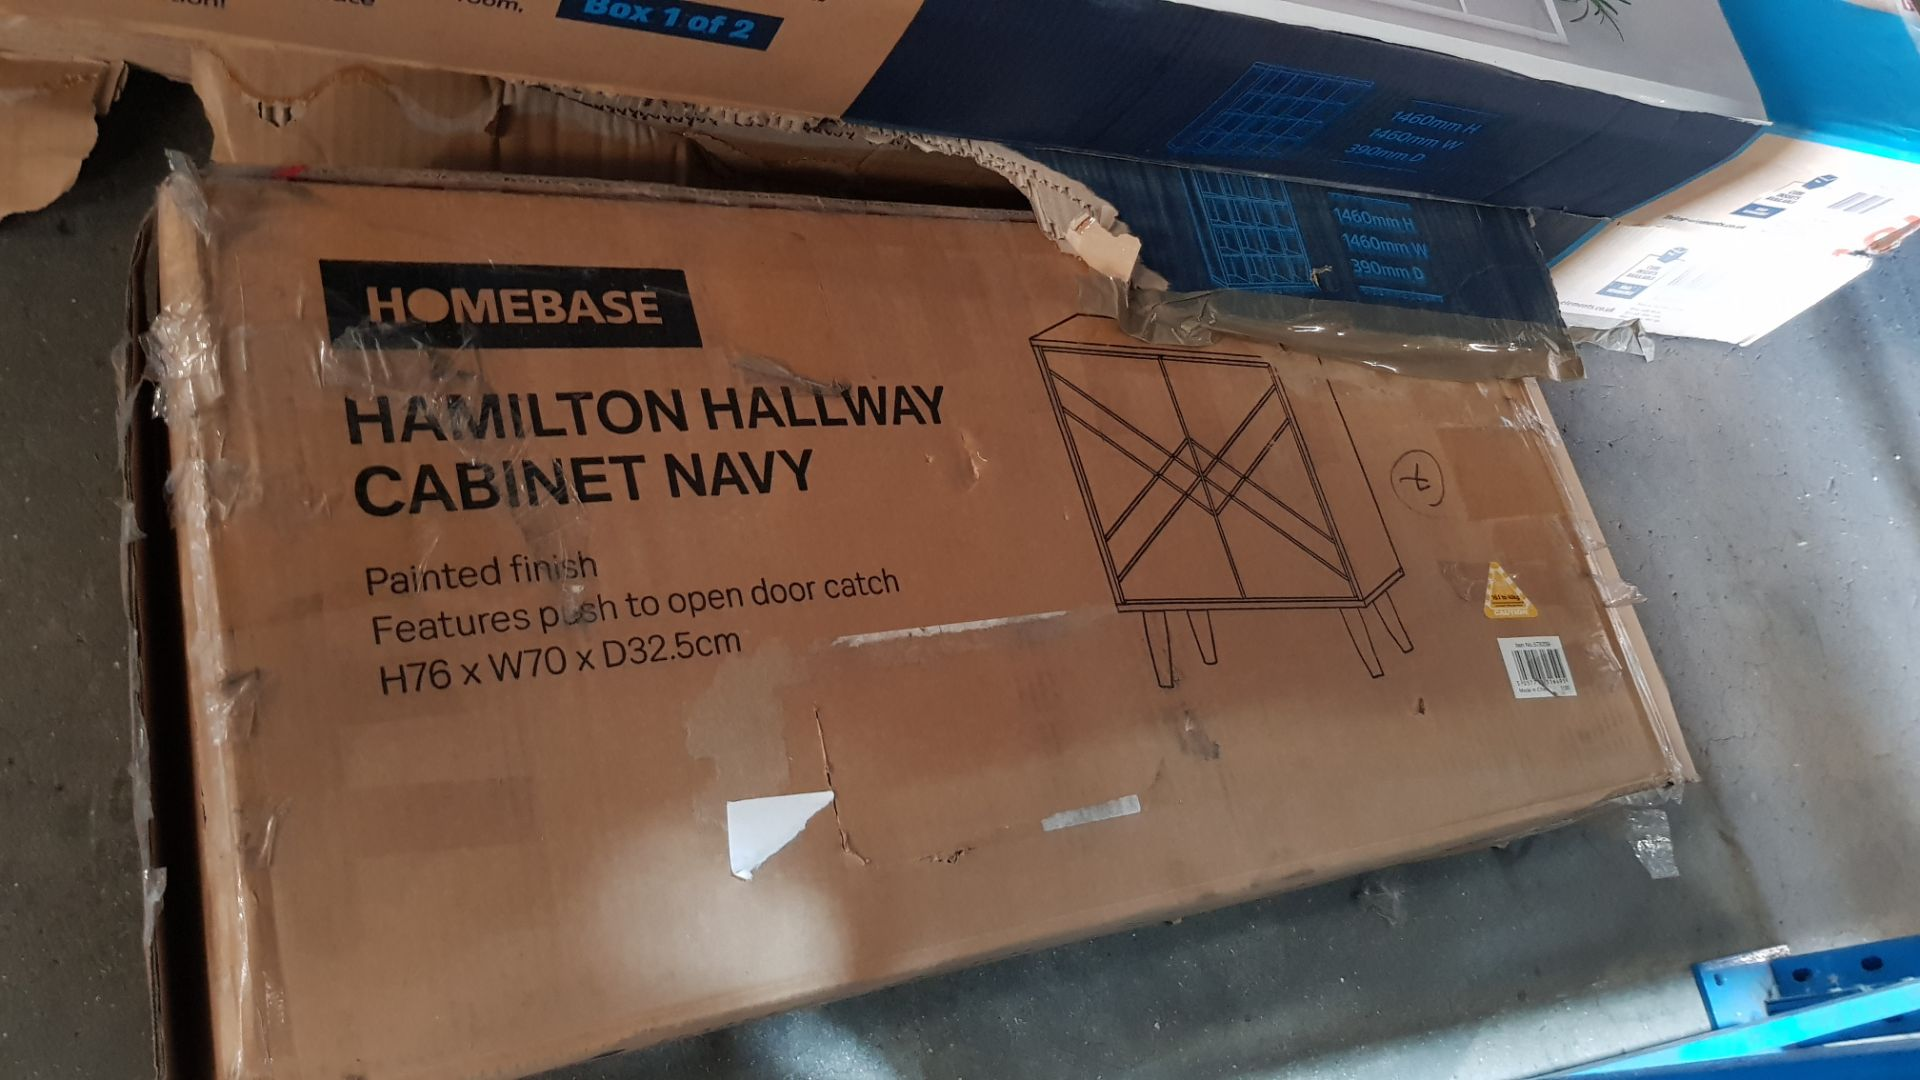 (2K) 4x Items. 1x Hamilton Shoe Cabinet Charcoal. 1x Hamilton Hallway Cabinet Navy (H76x W70x D32.5 - Image 6 of 8